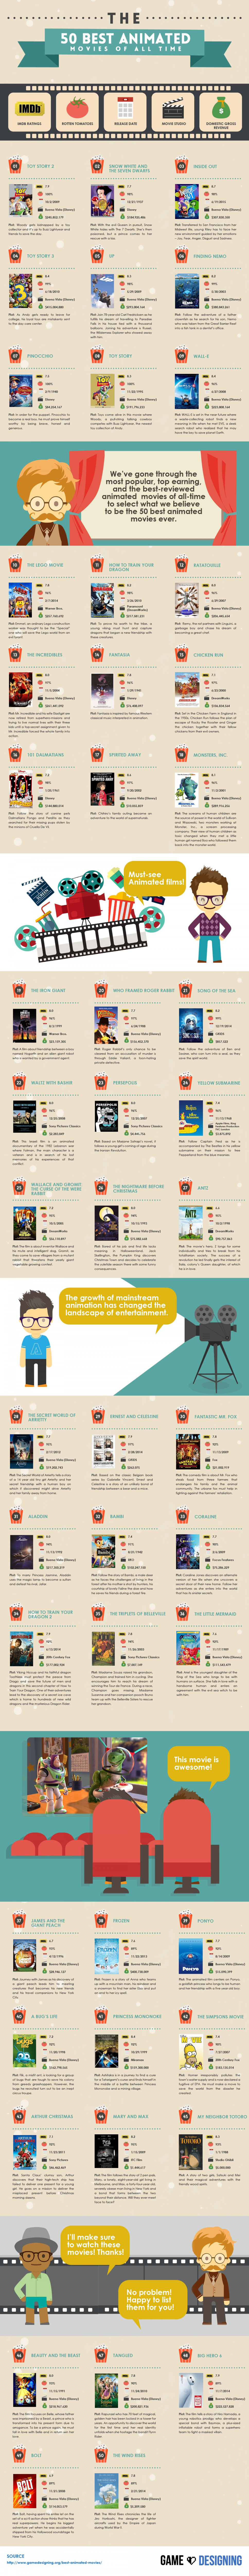 50 mejores filmes animados